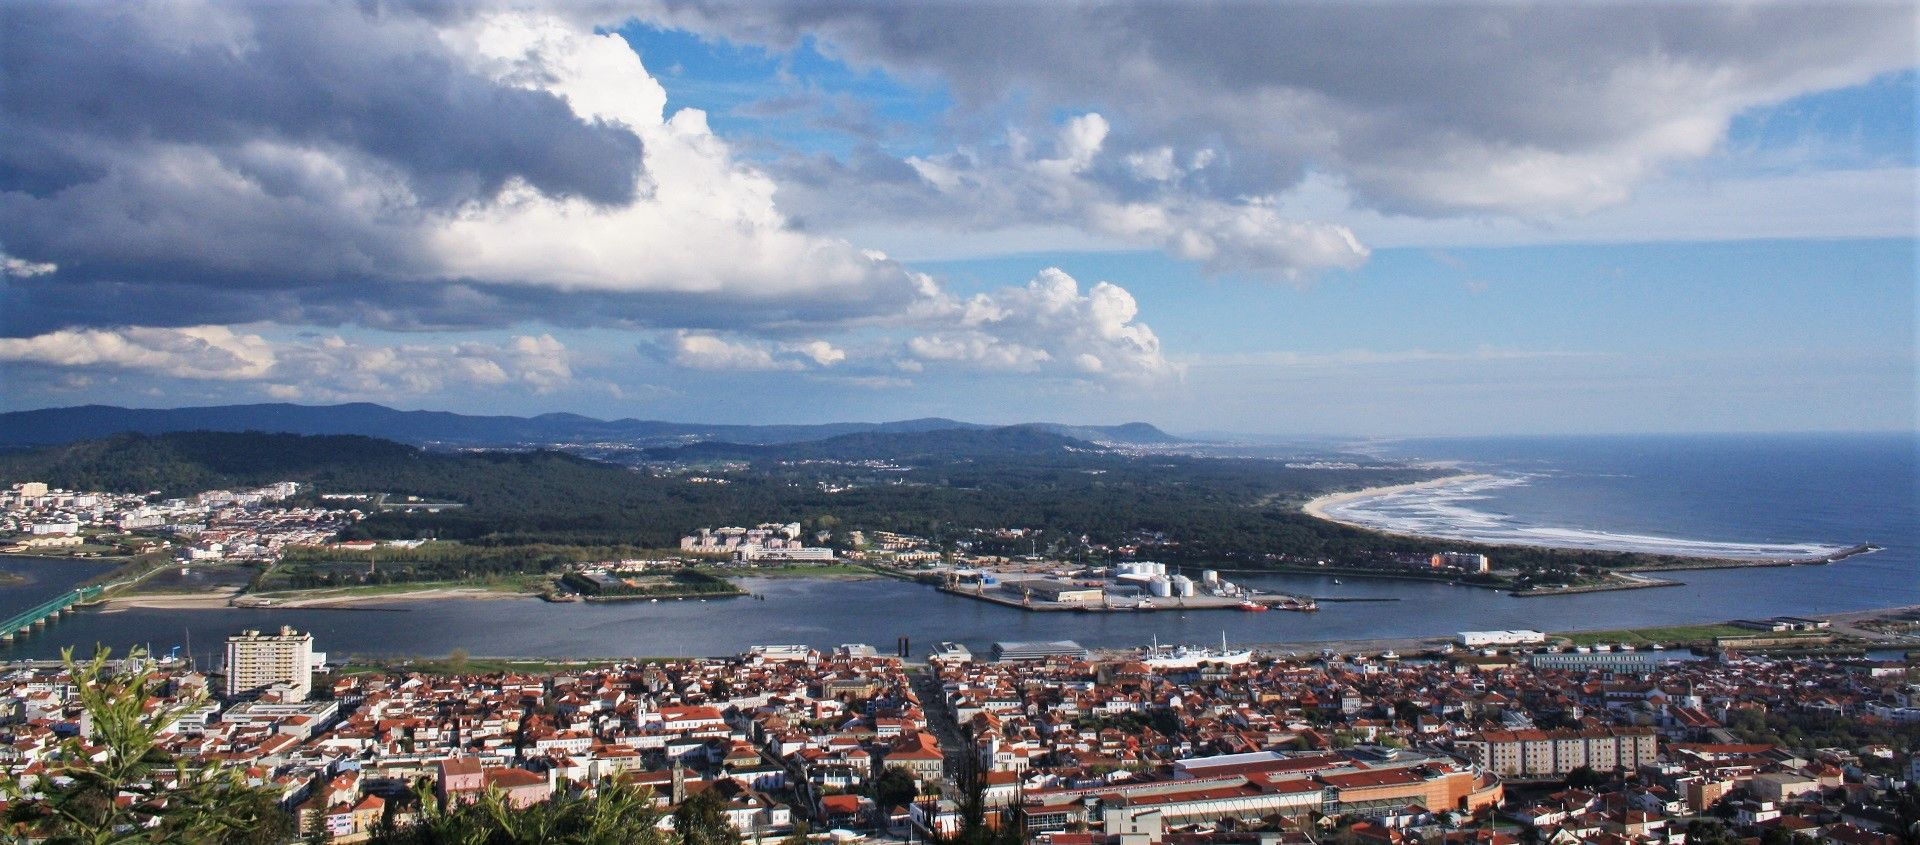 Zona Empresarial da Praia do Norte, mais 25 anos